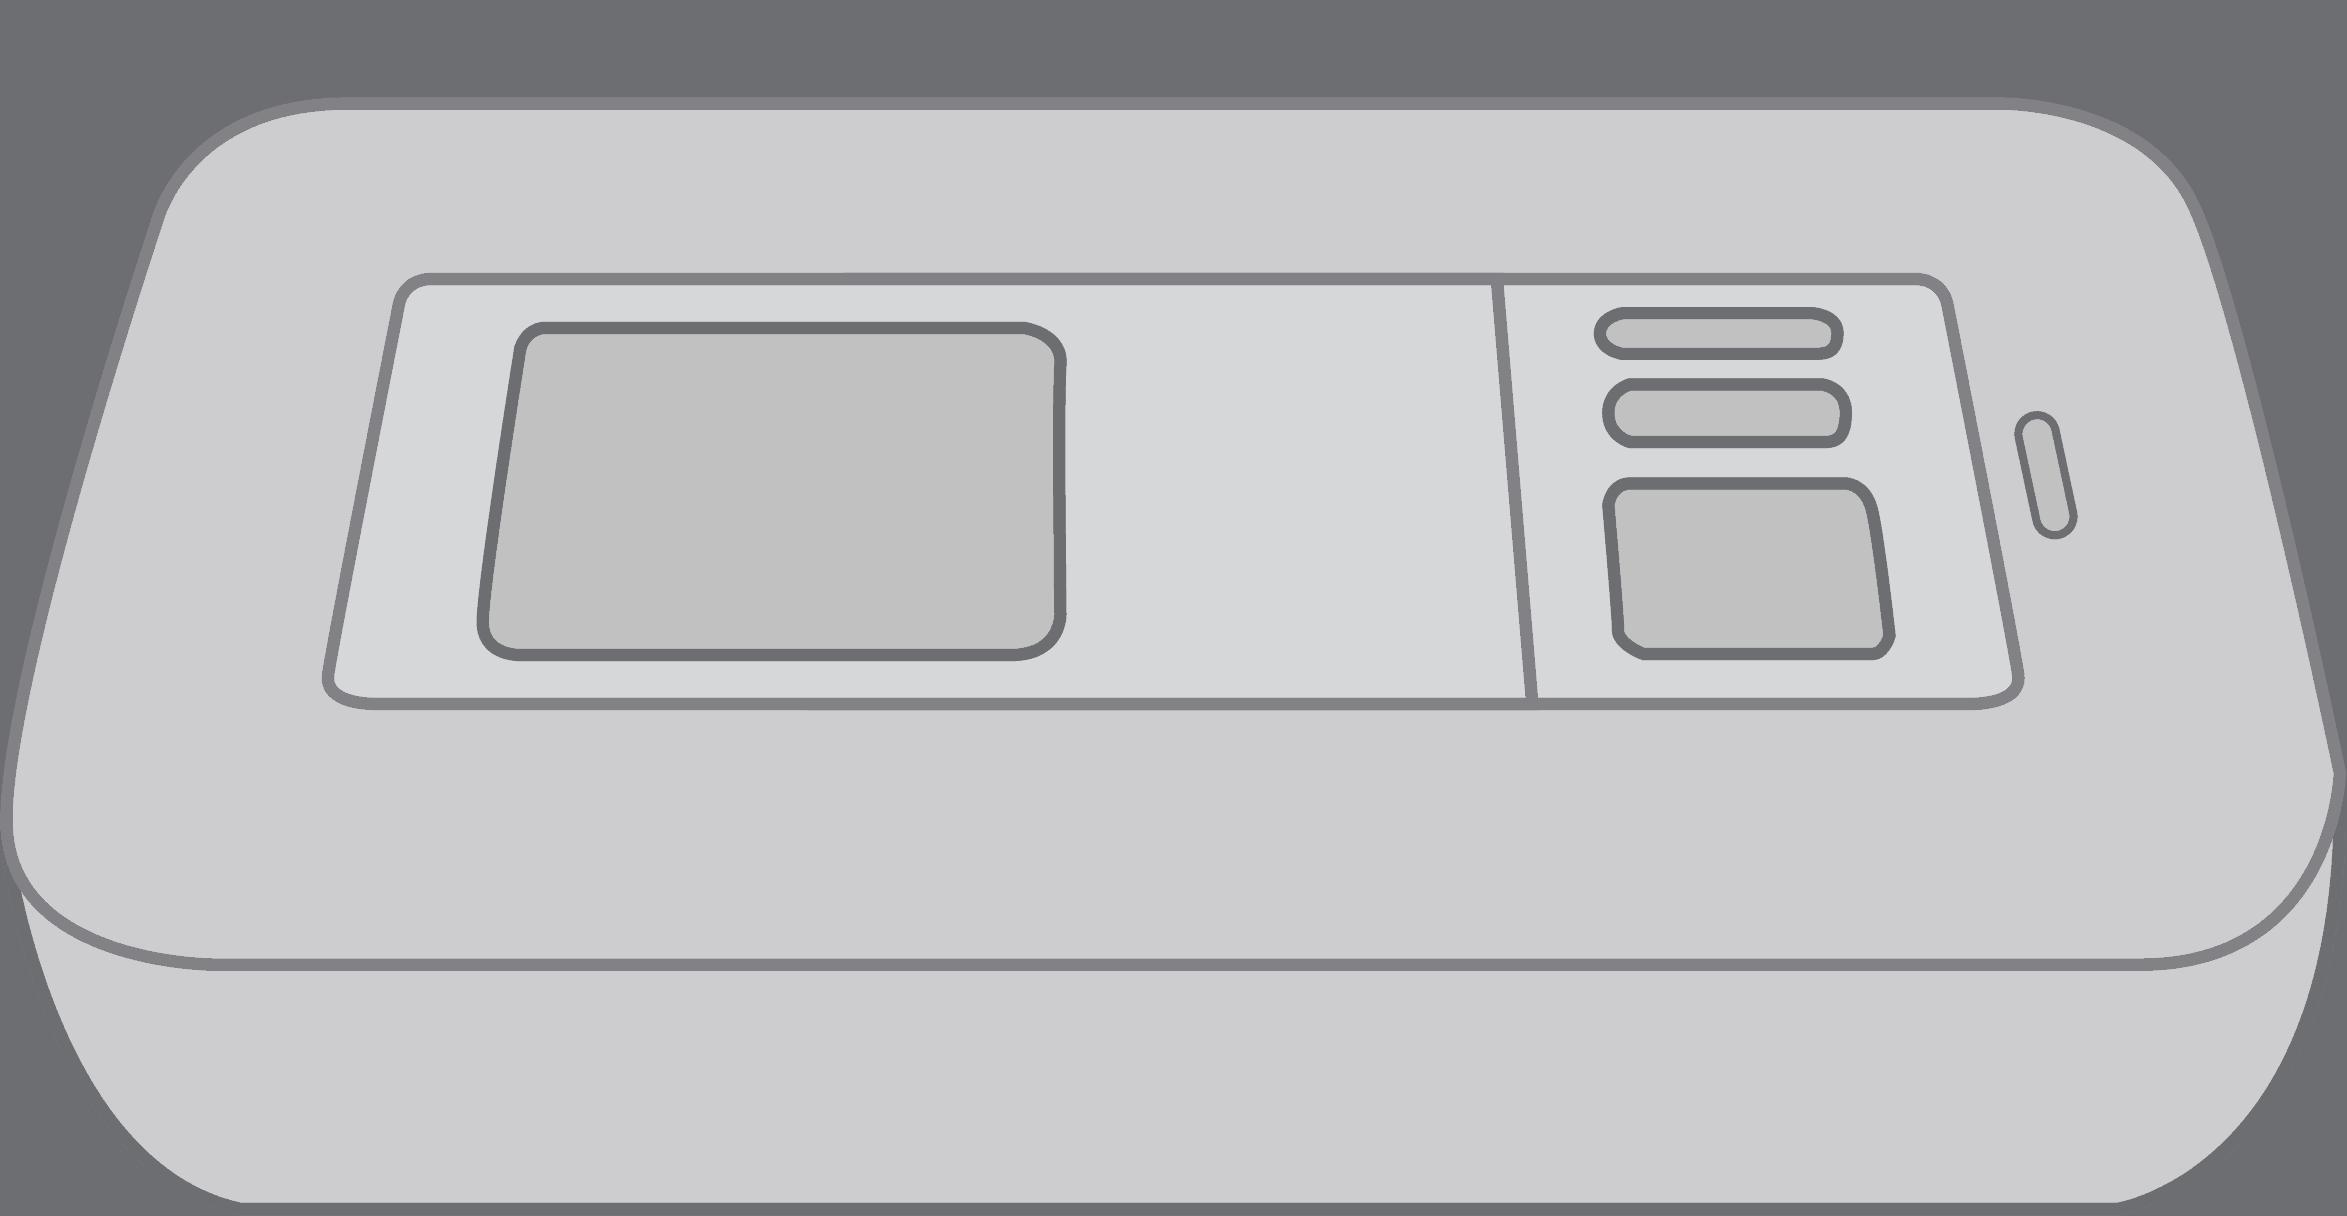 Careline icon